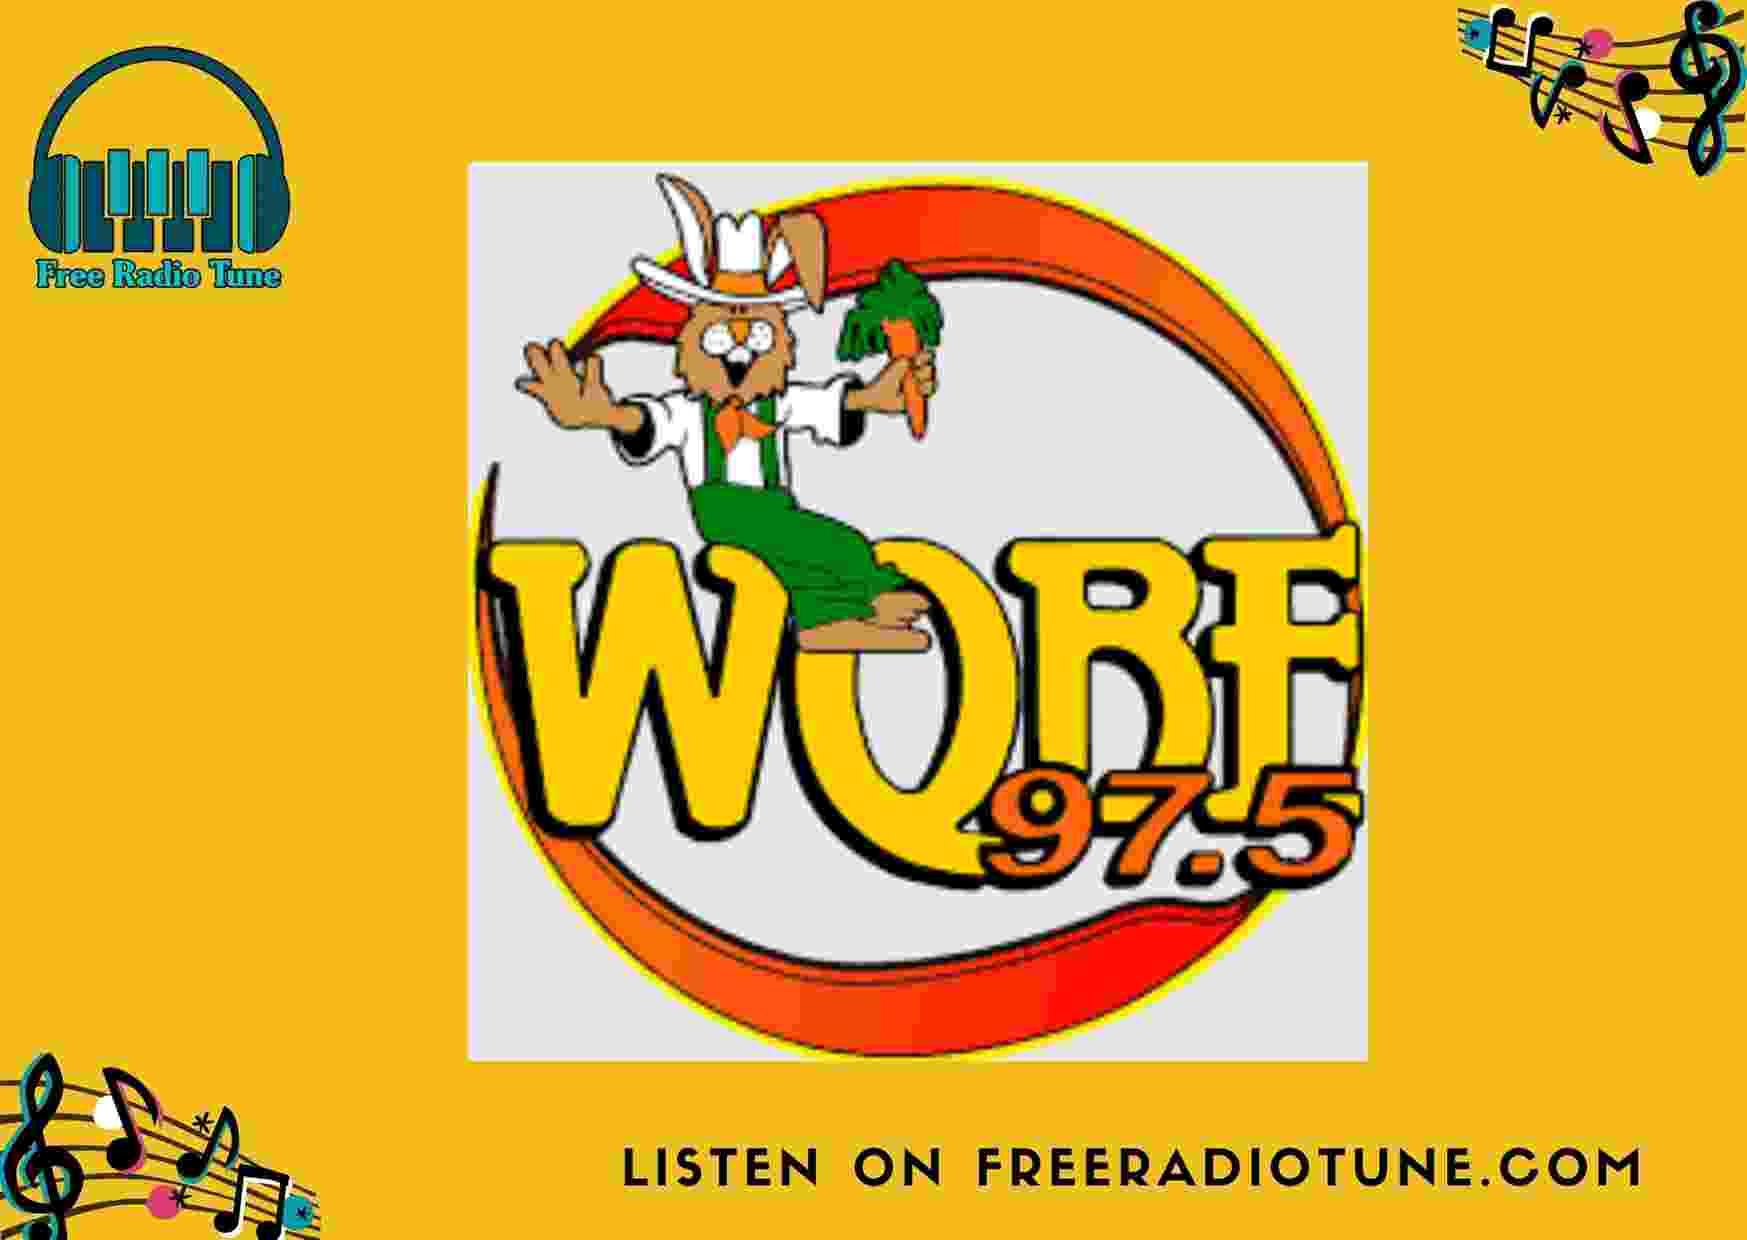 wqbe 97.5 Live Online